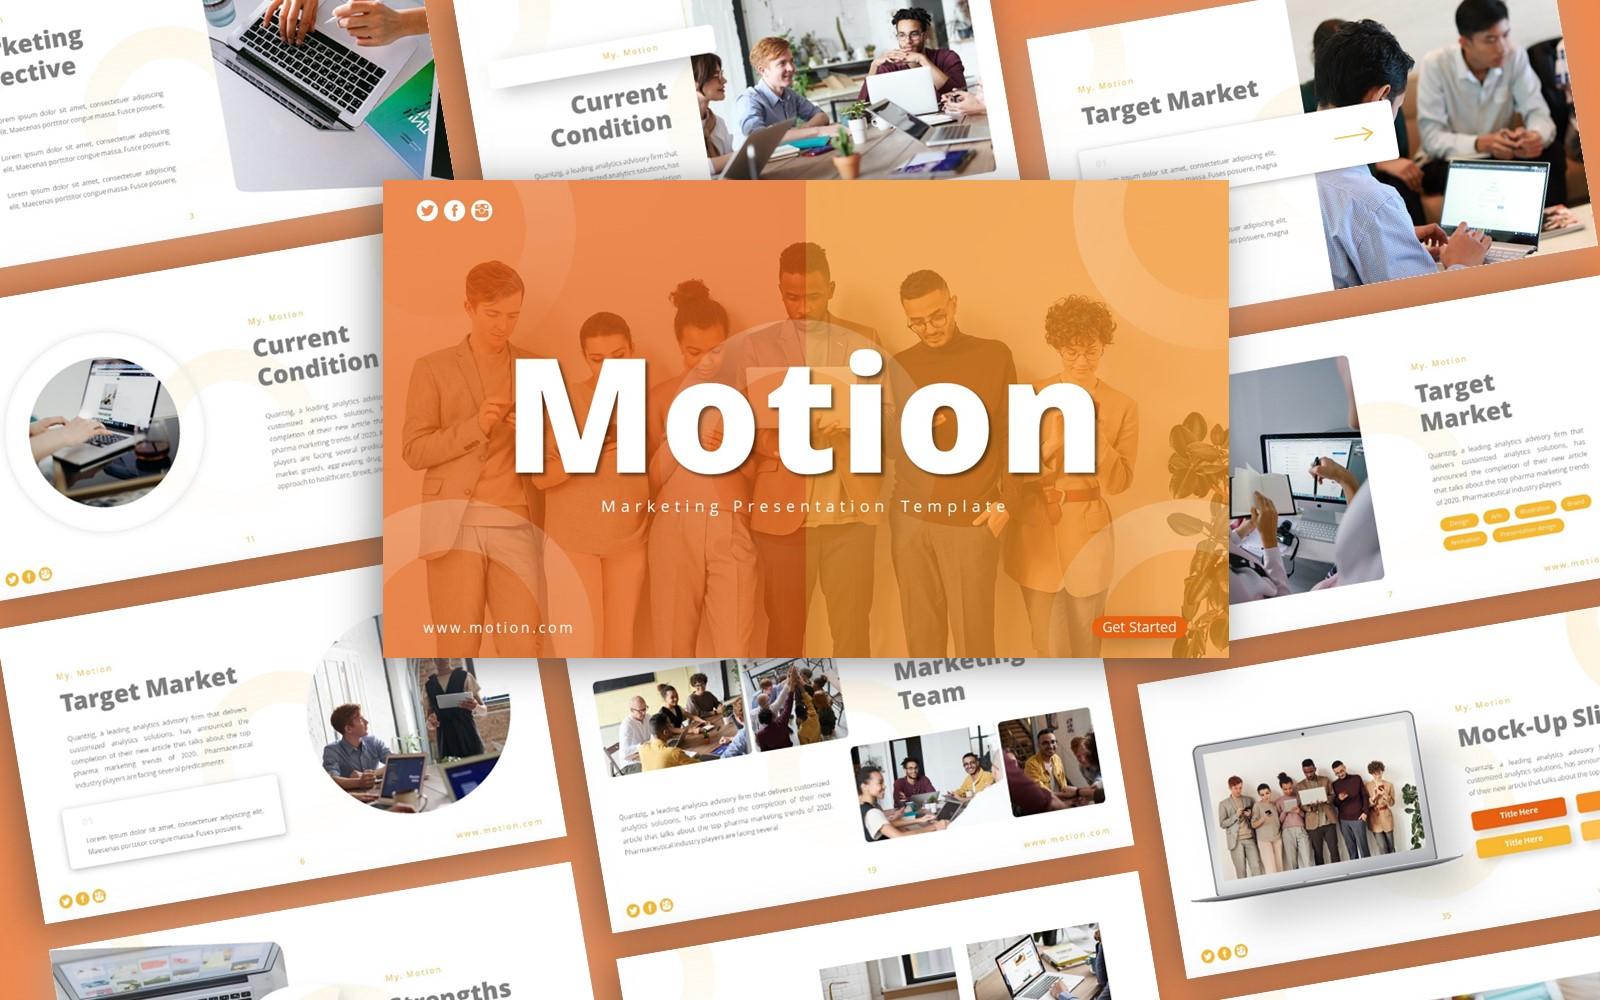 Motion Marketing Presentation PowerPoint Template